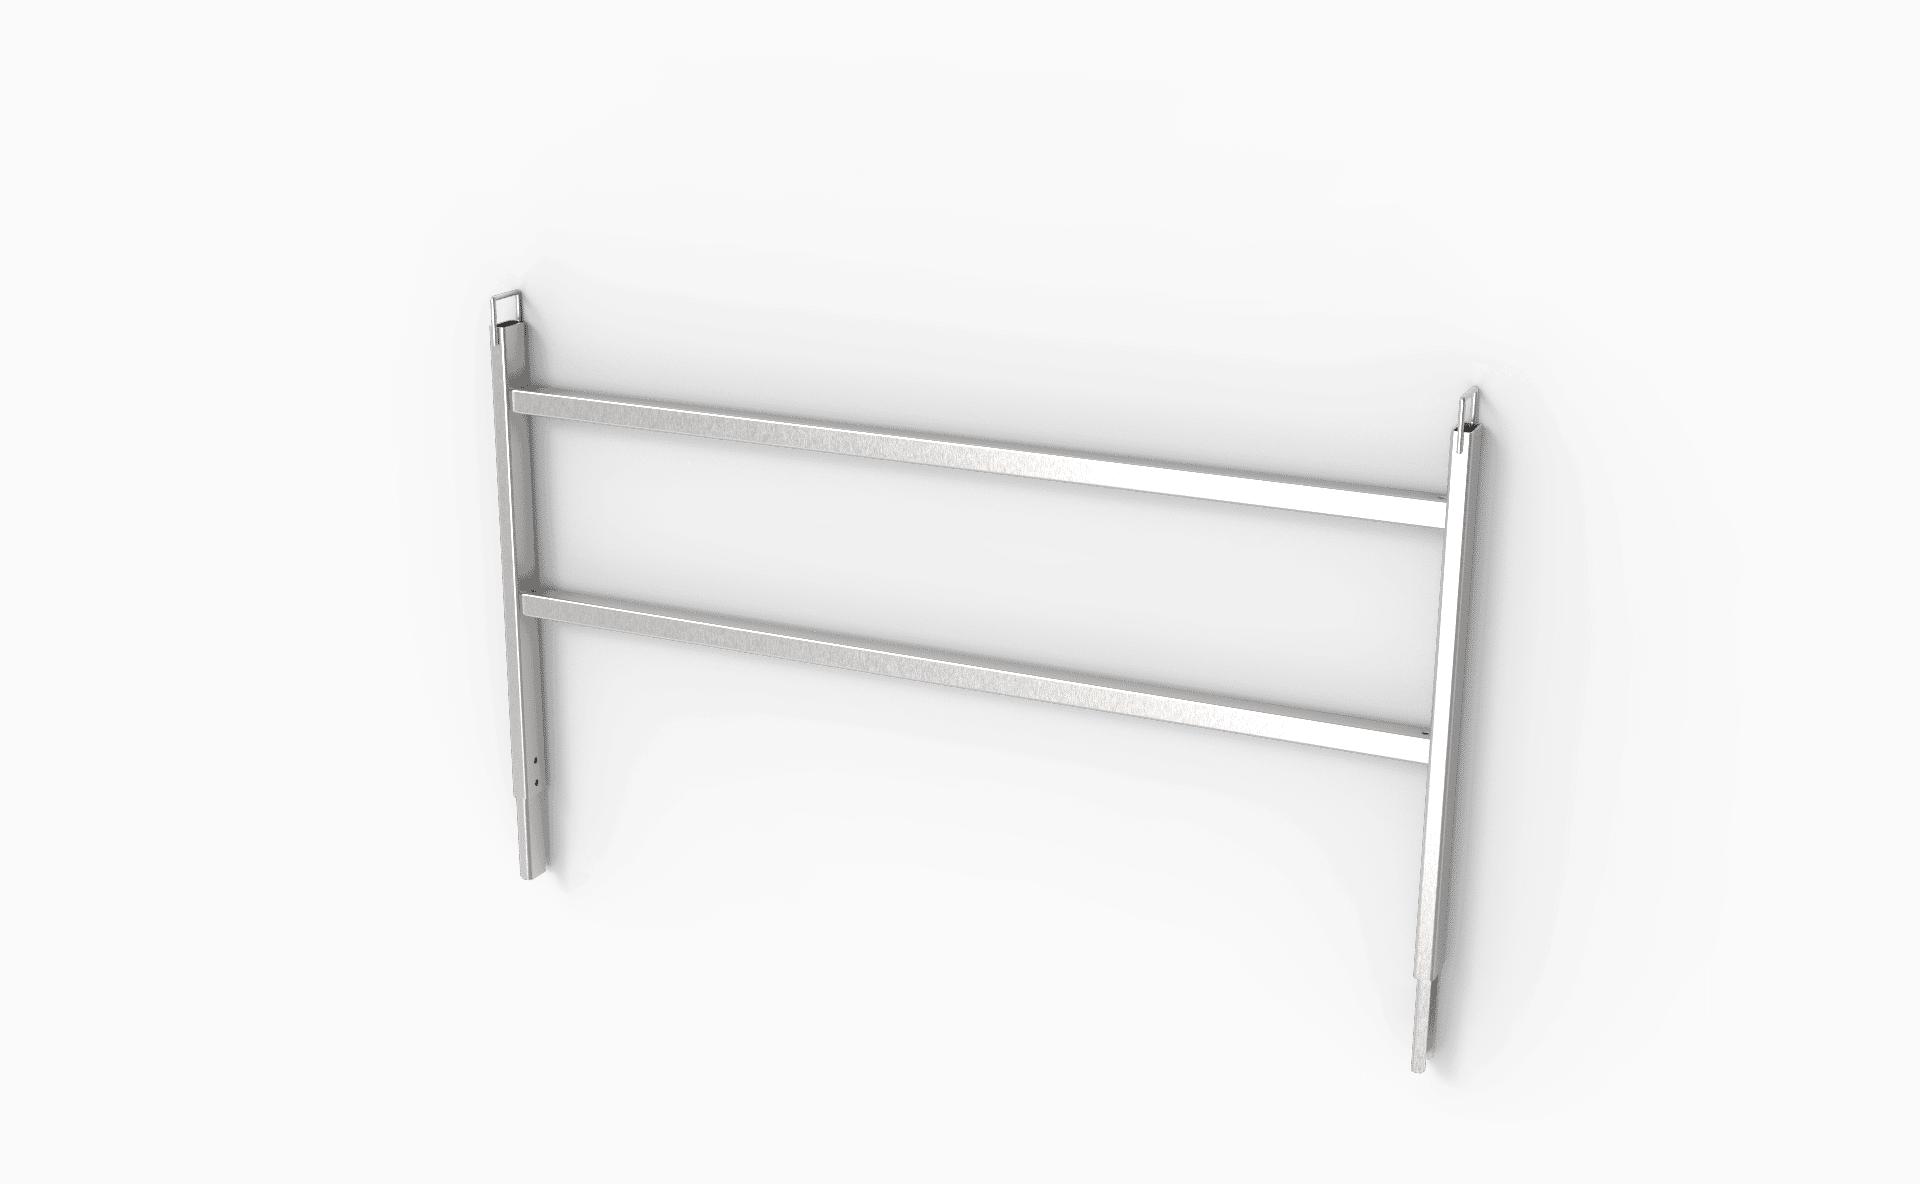 H-Gestell 800 mm Höhe